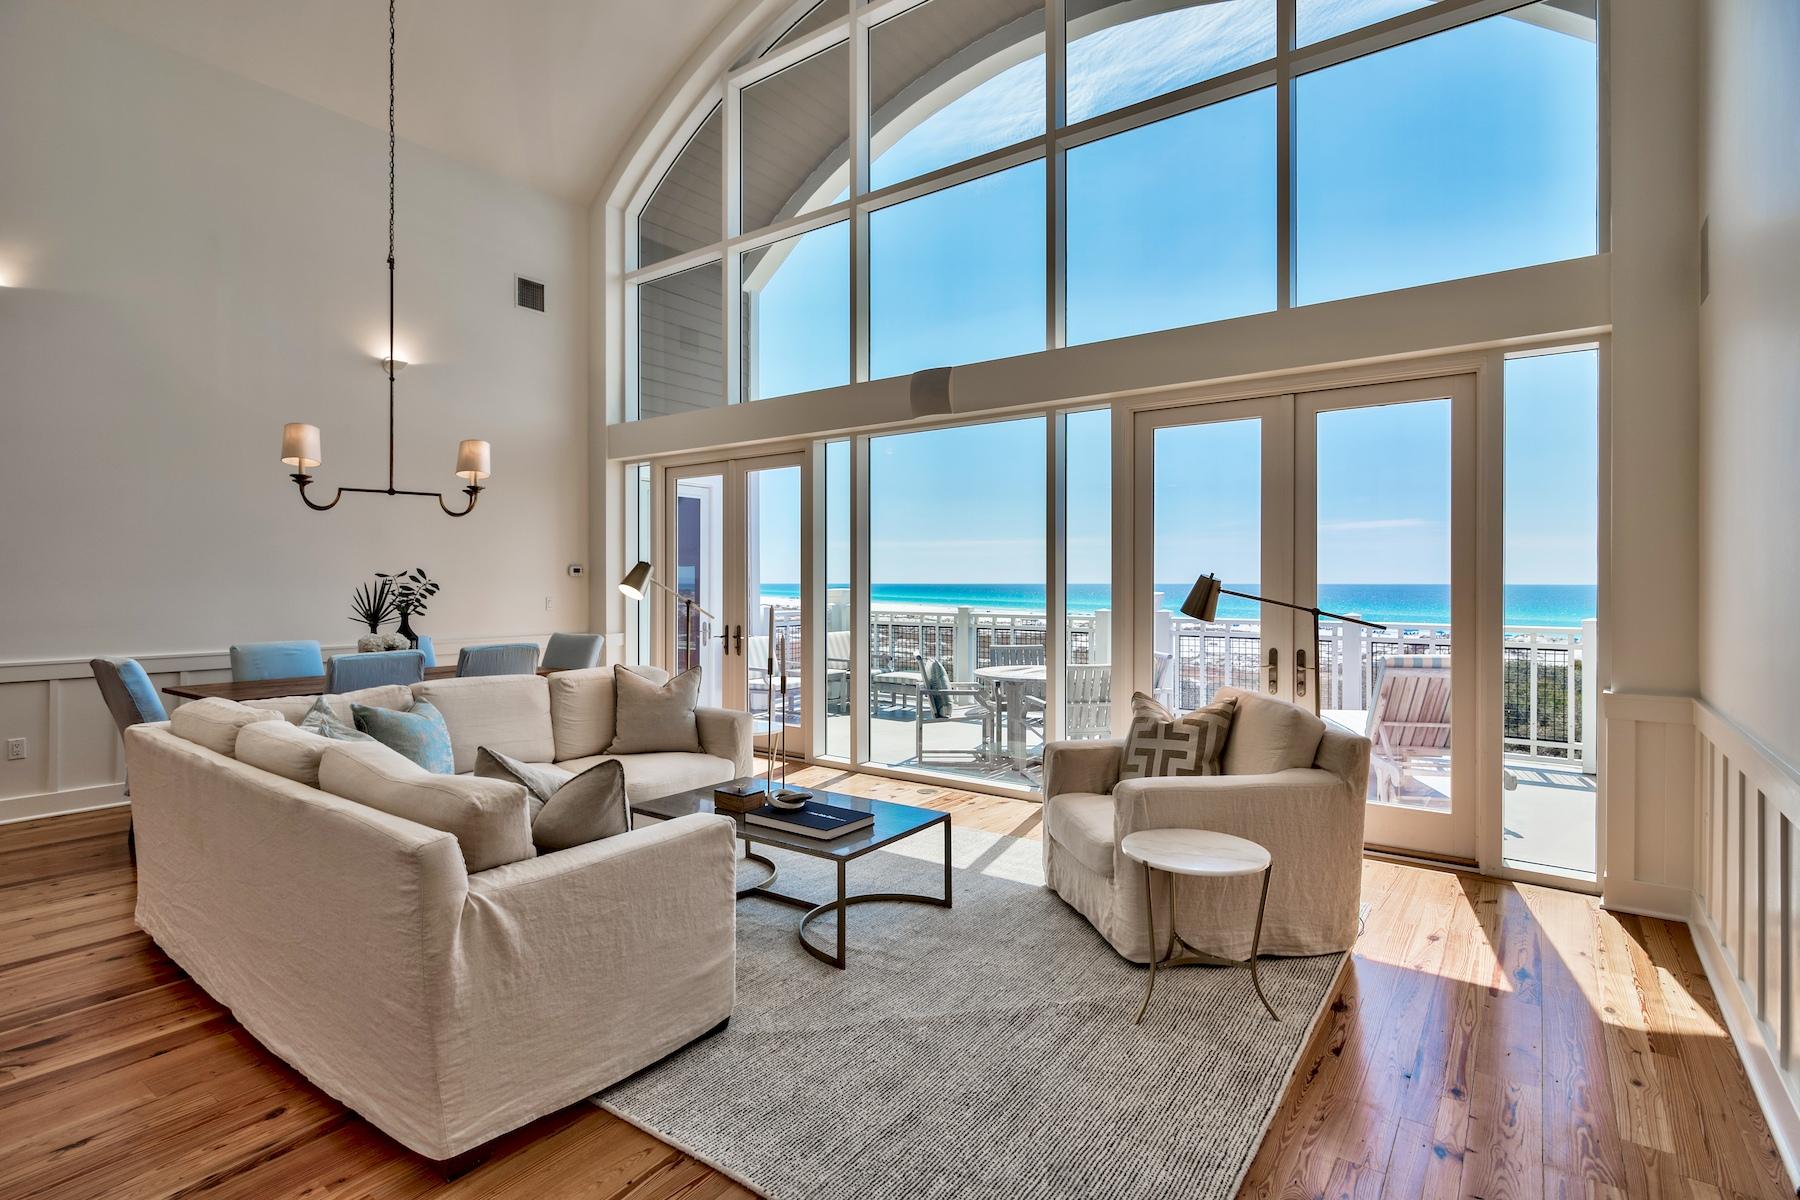 共管物業 為 出售 在 Top Floor WaterSound Beach Condo with the Ultimate Gulf View 37 S Compass Point Way 424, Watersound, 佛羅里達州, 32461 美國